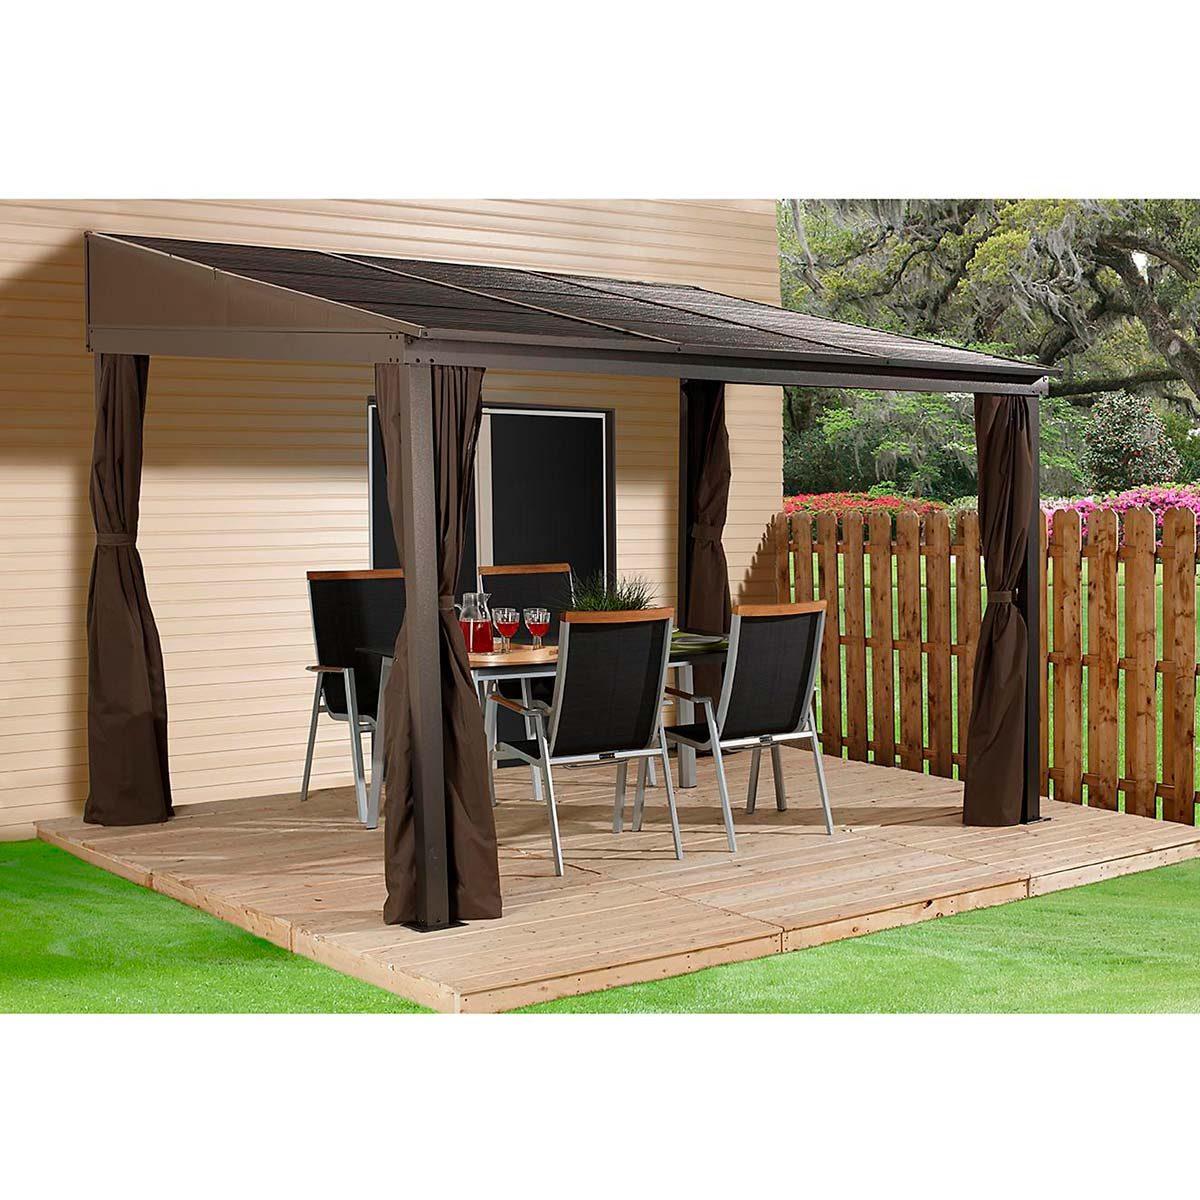 10 metal deck roof options we love